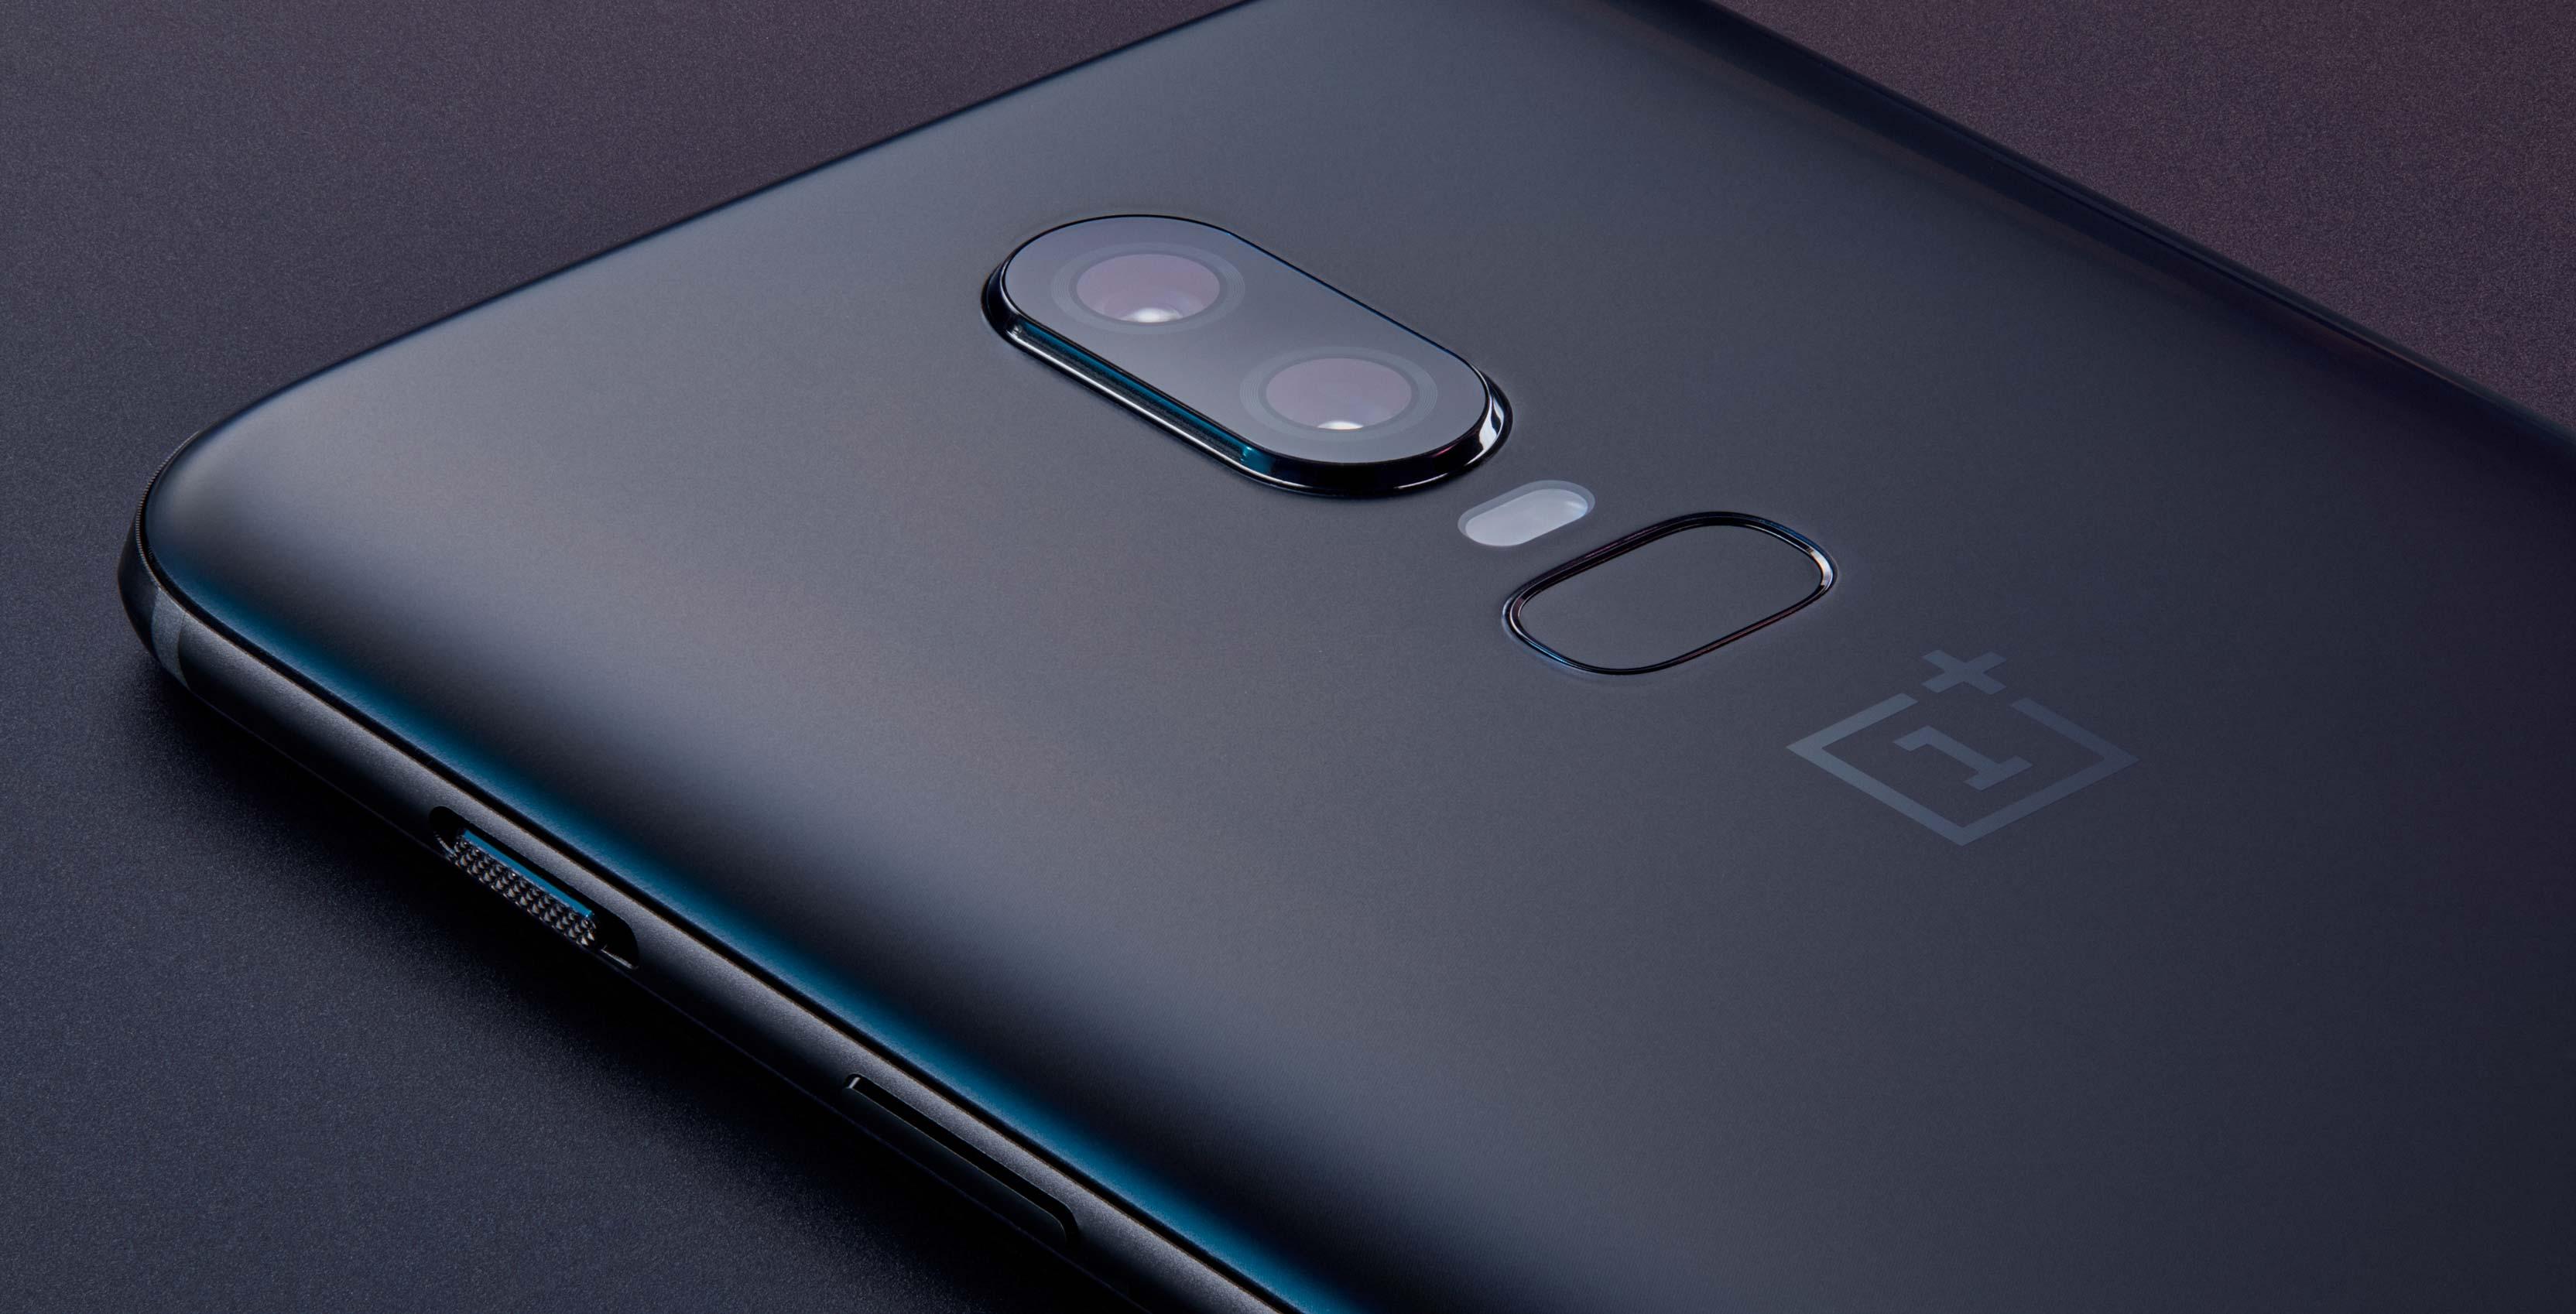 OnePlus 6 back